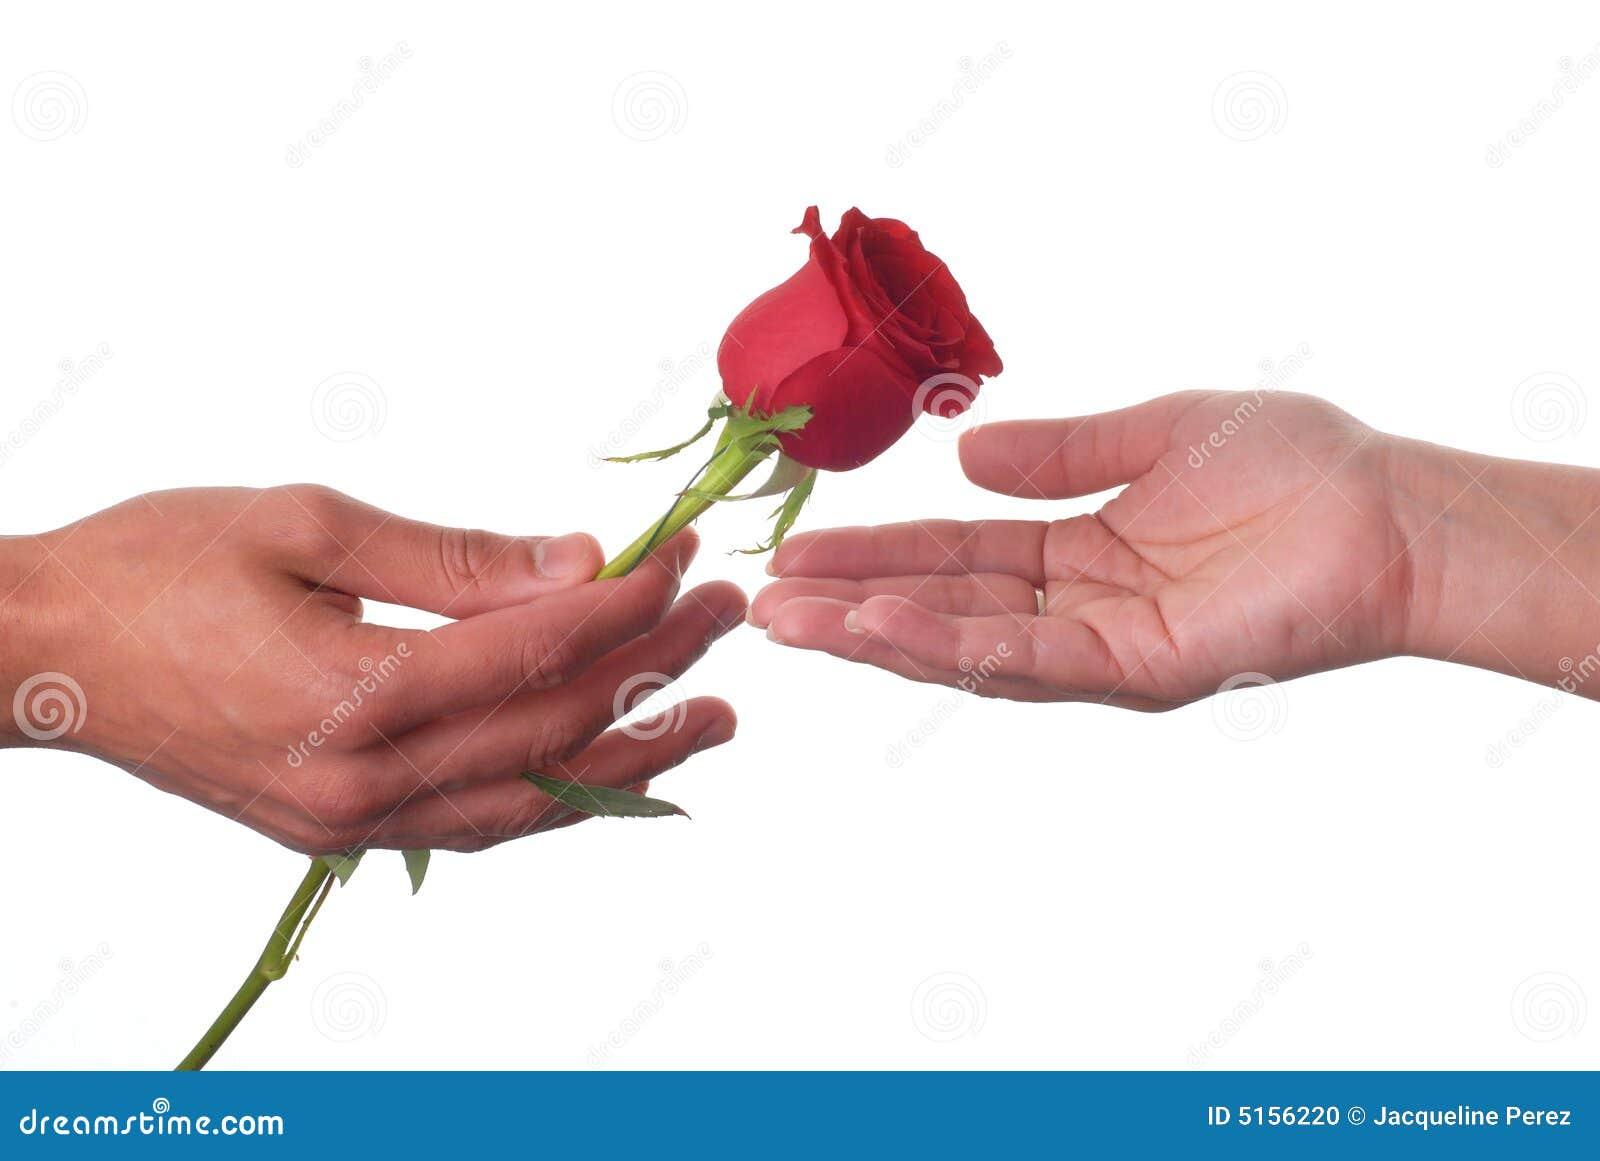 I Love You Heart Wallpaper 3d Love Rose Stock Photo ...